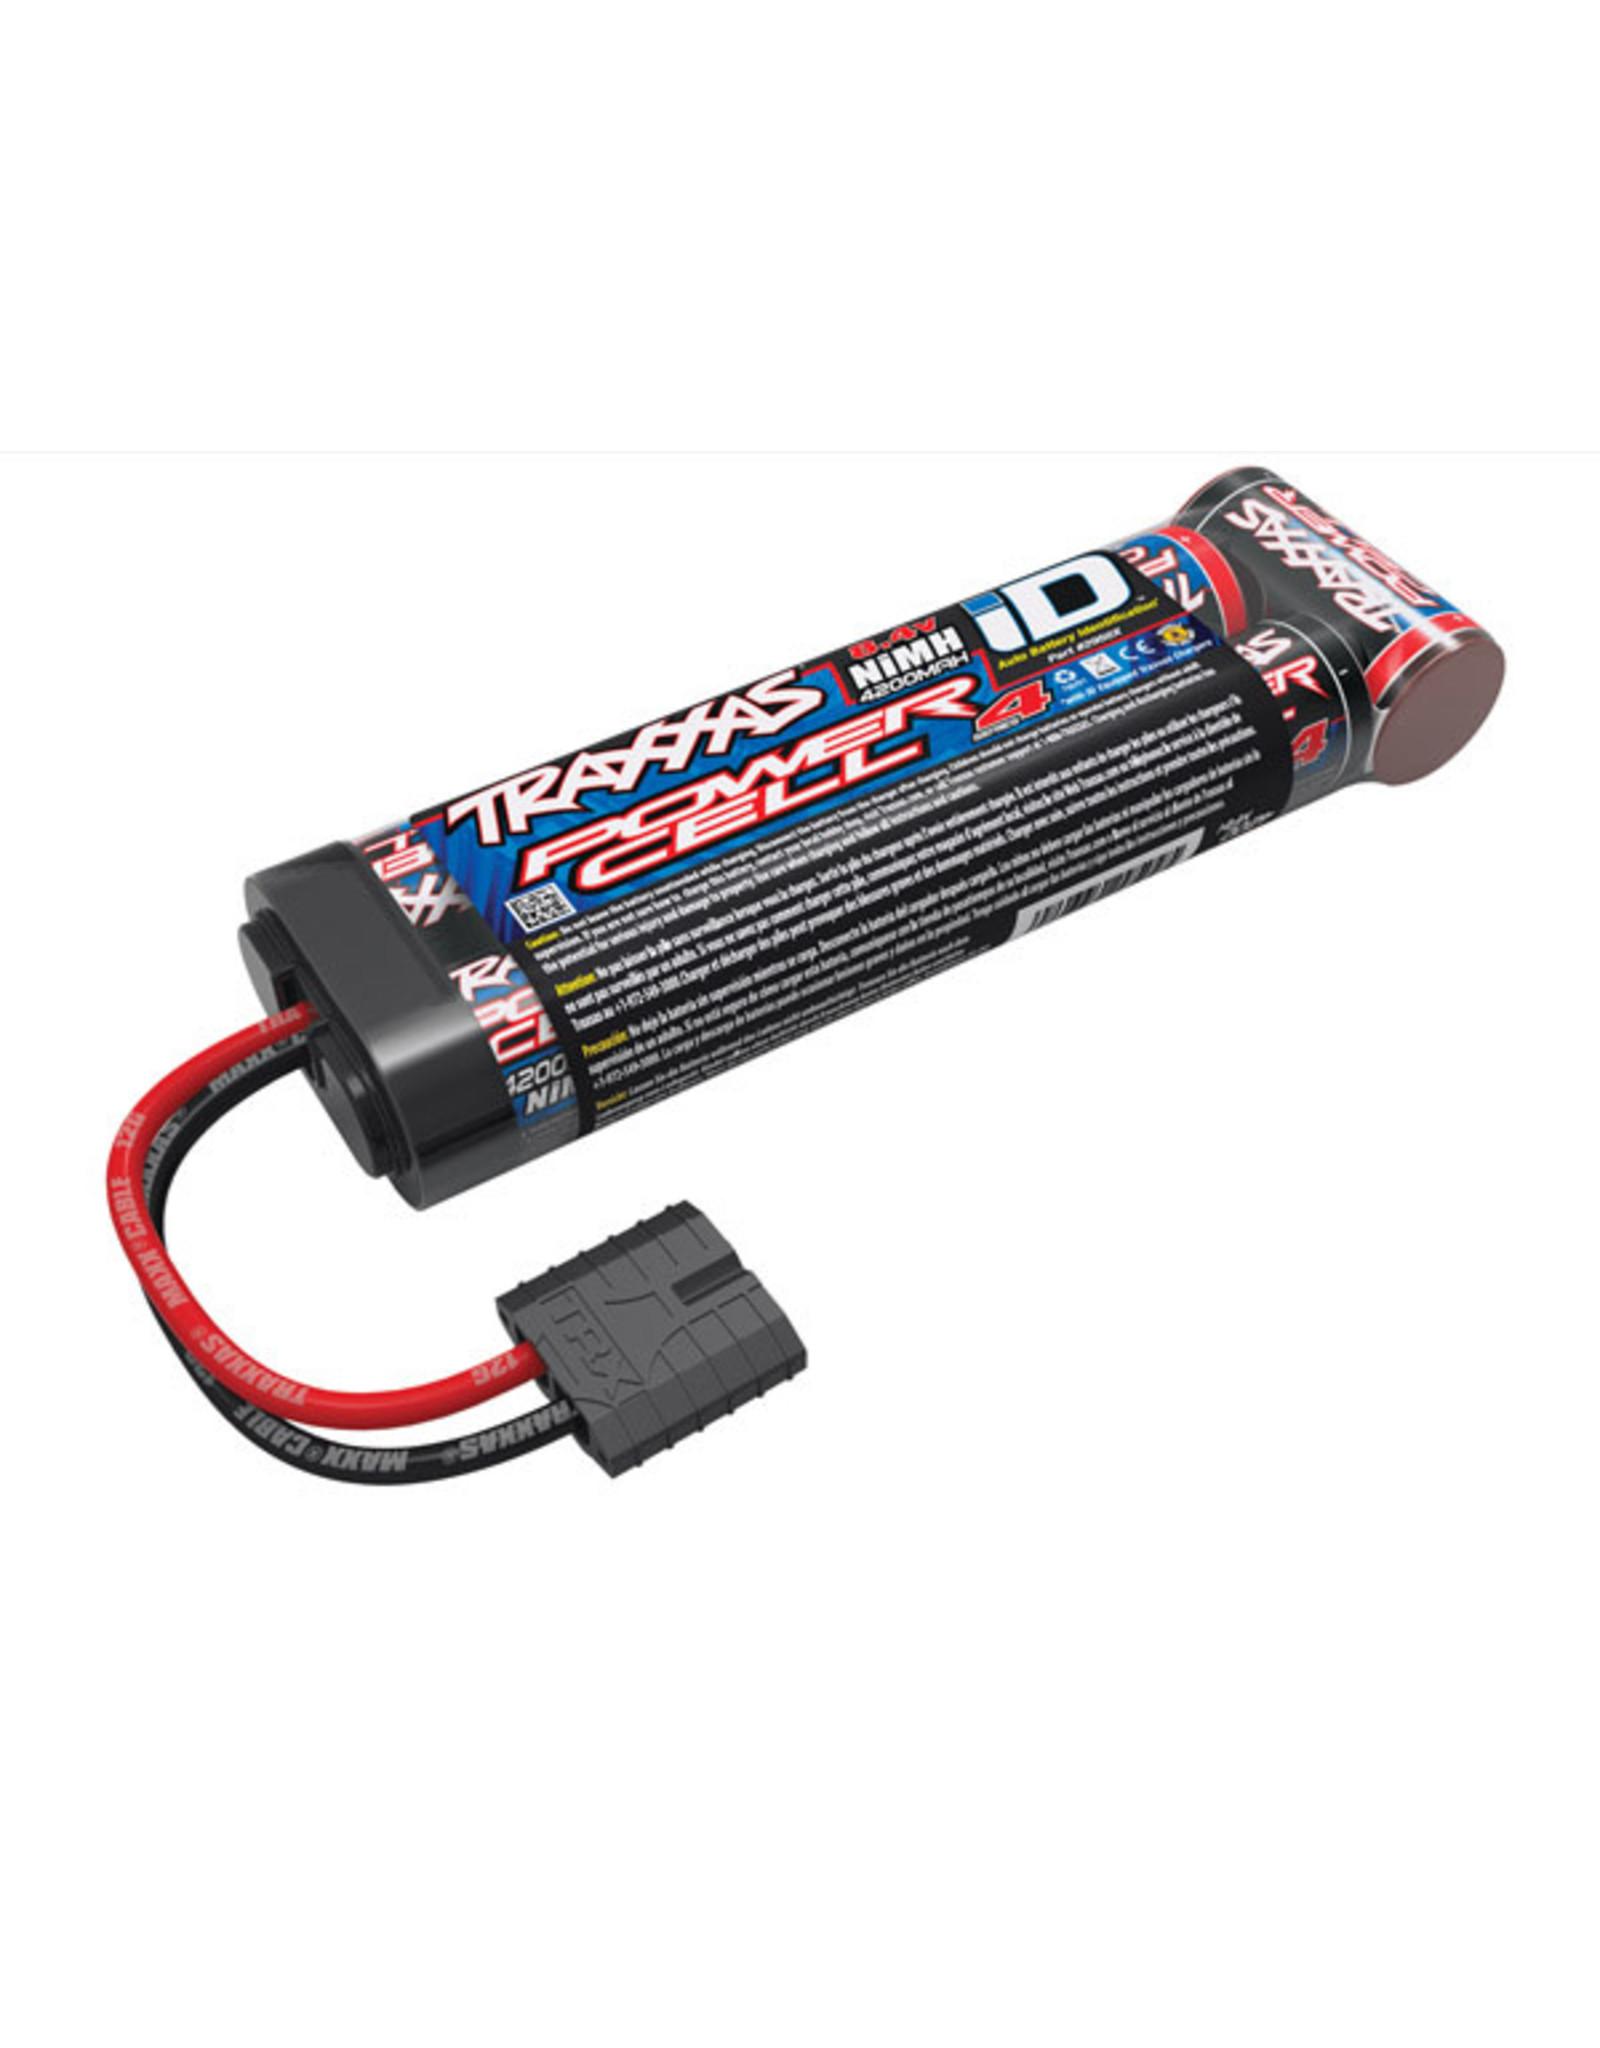 Traxxas Battery, Series 4 Power Cell, 4200mAh (NiMH, 7-C flat, 8.4V)